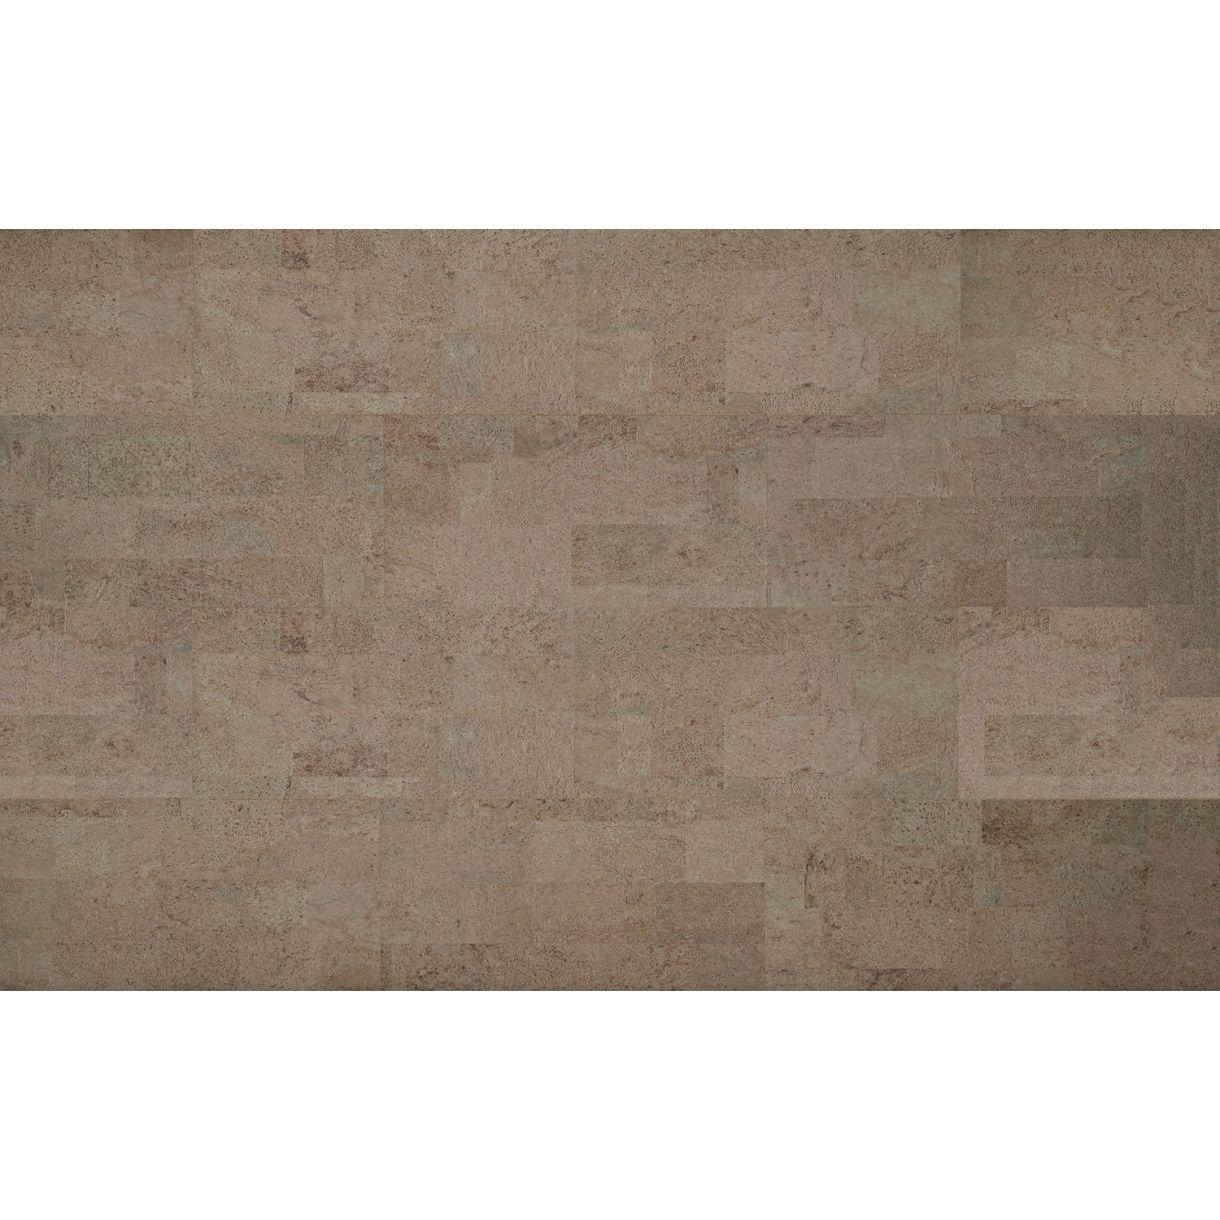 Decorative cork wall tiles MALTA PLATINUM 3x300x600mm - package 1 ...